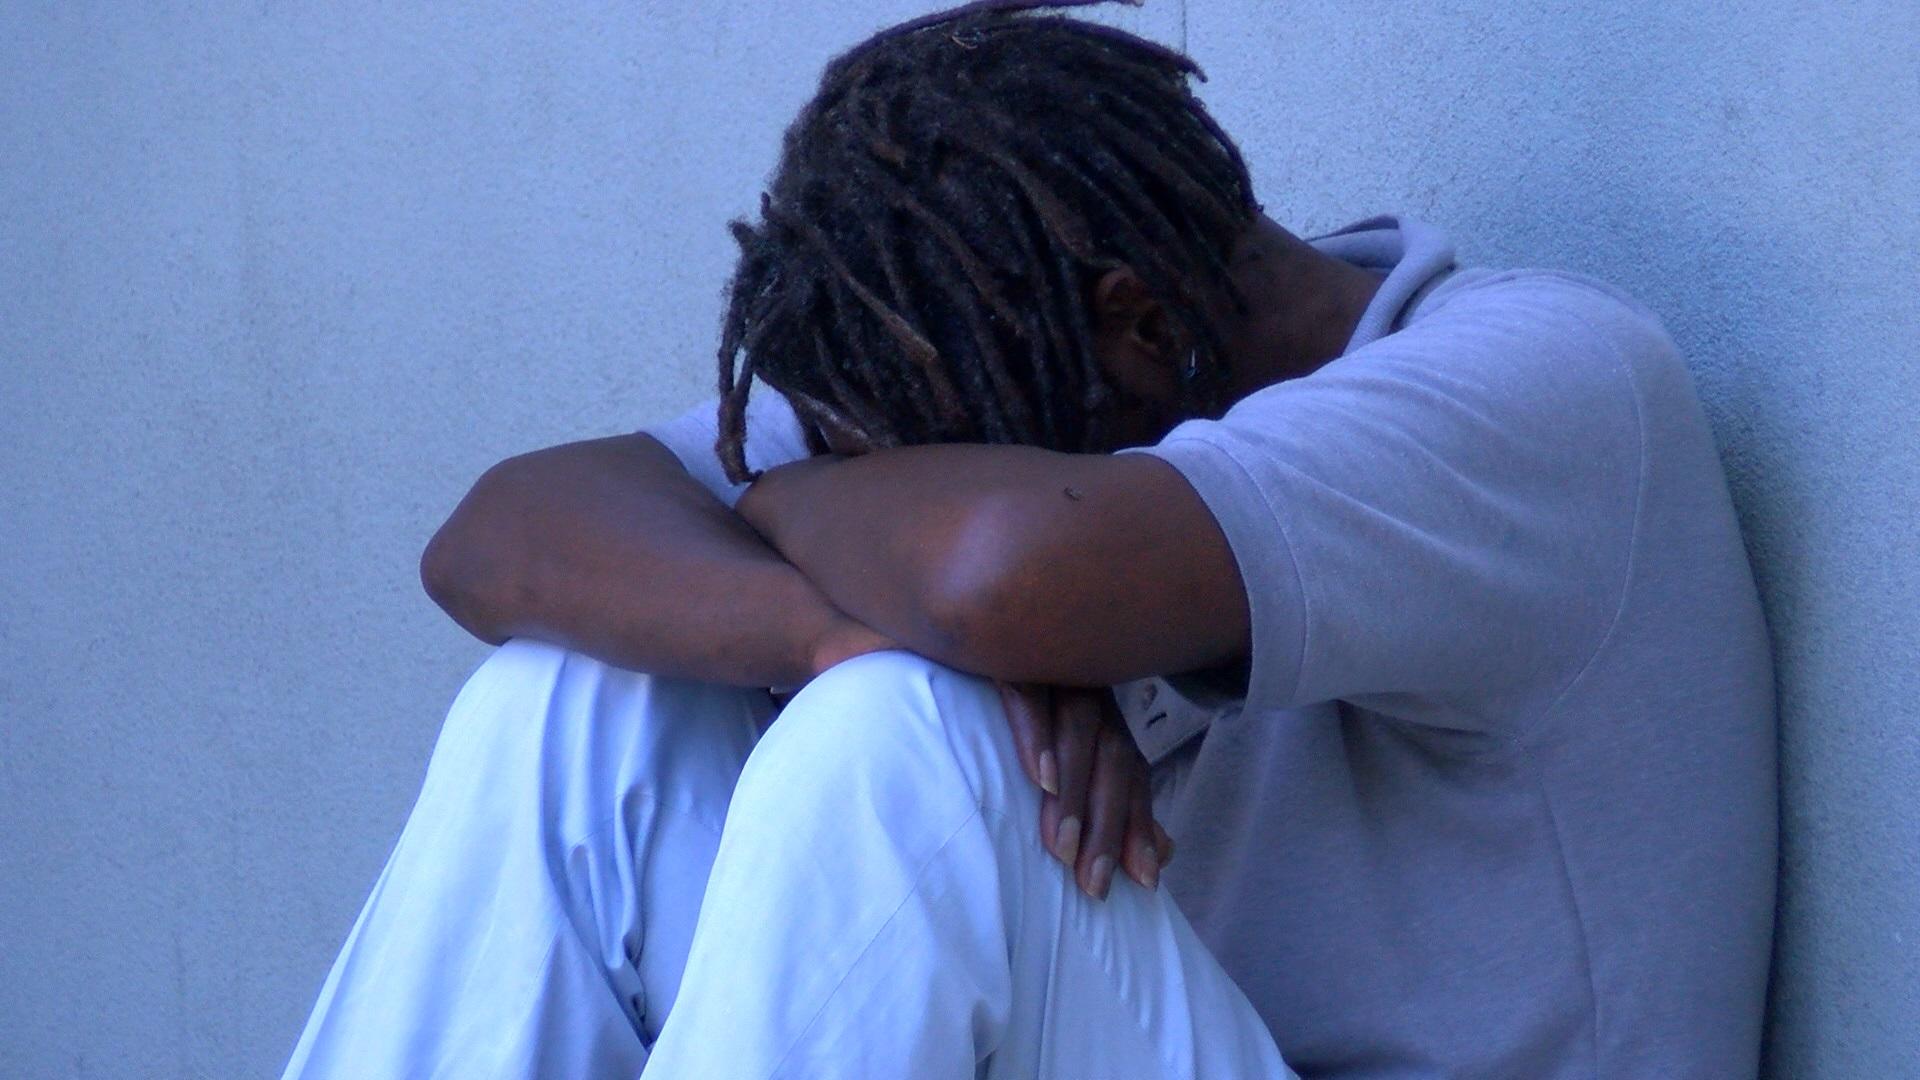 homeless-person_1438294238302.jpg